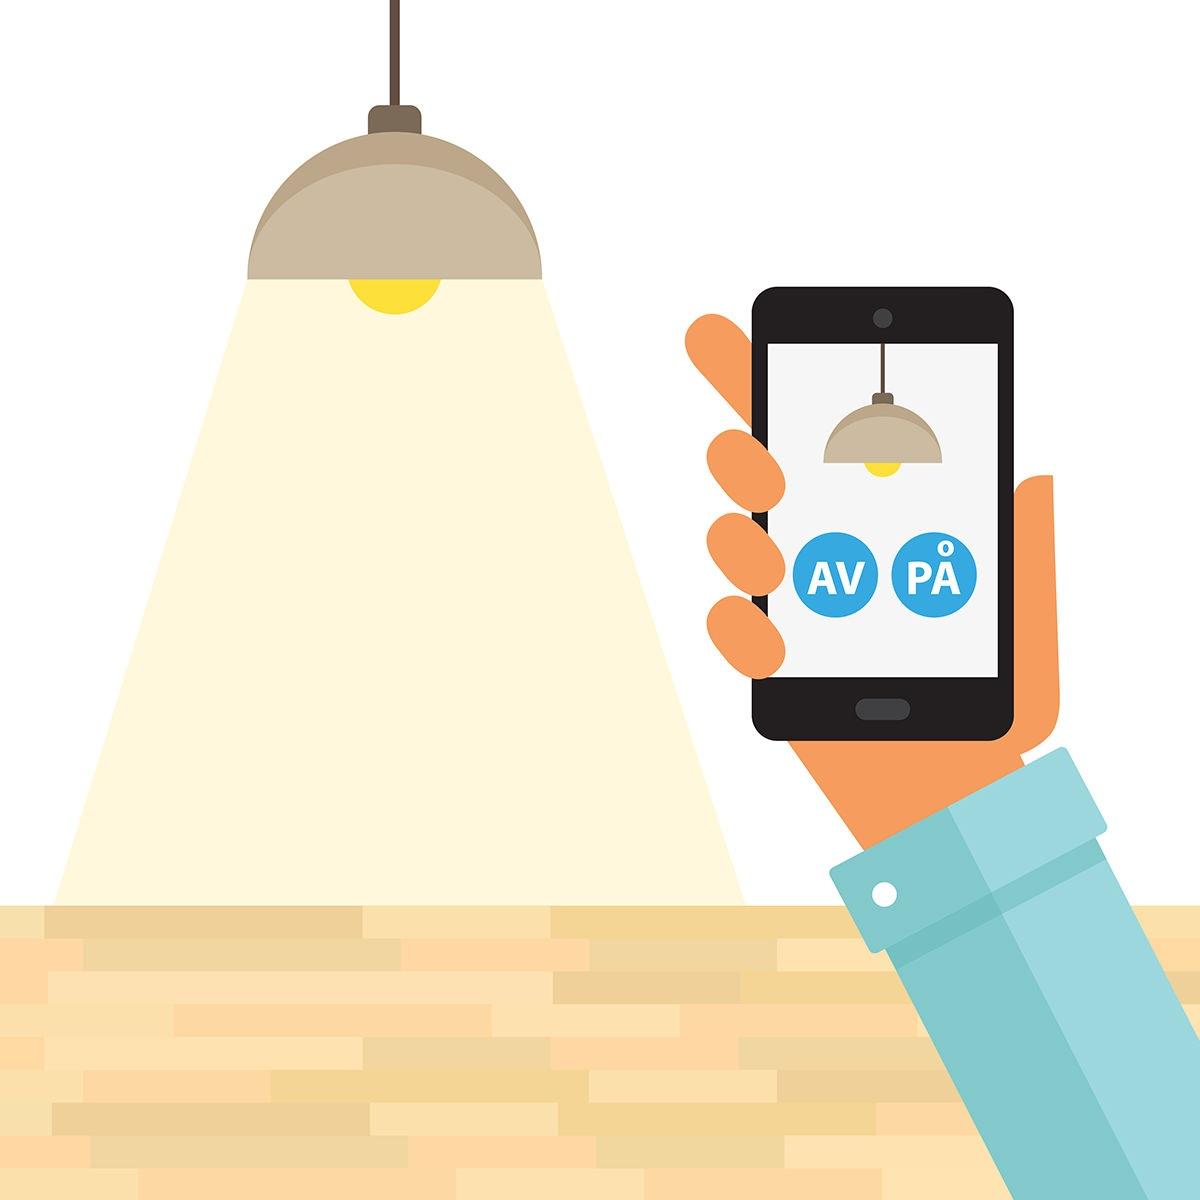 I en future living bolig kan man skru av aller på lyst med telefon